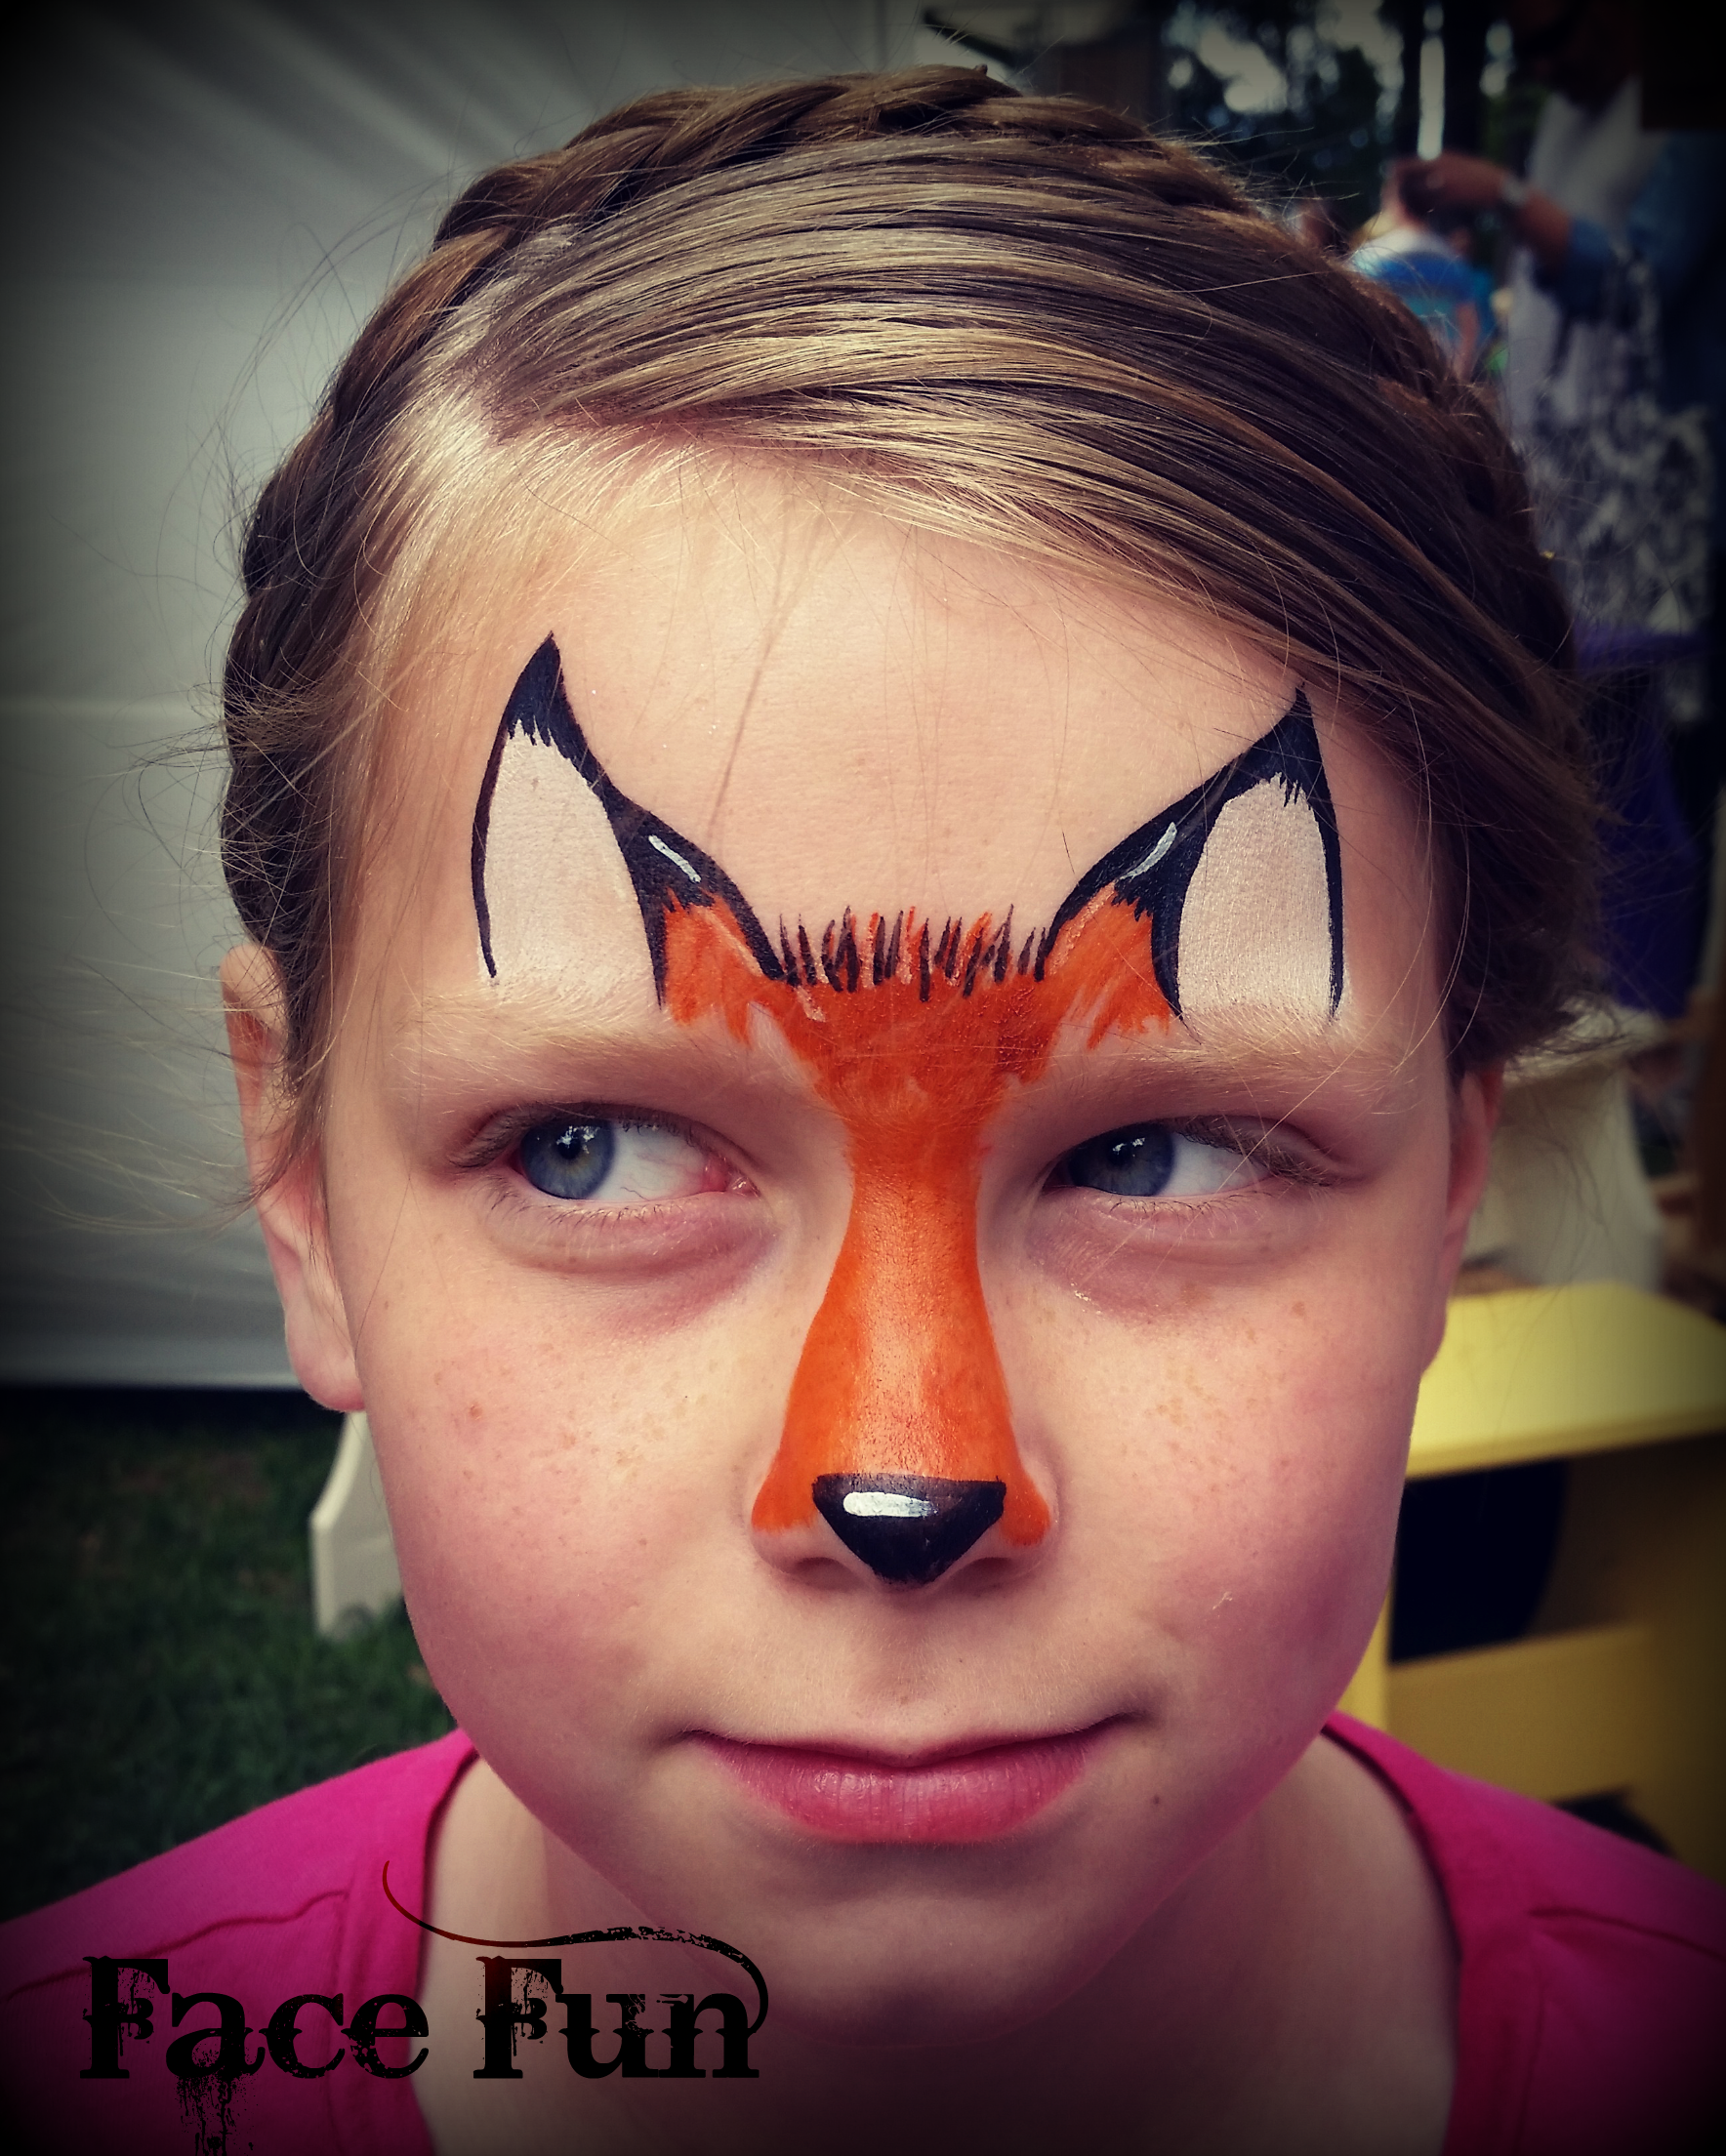 Uncategorized Cute Face Paint Designs a cute fox face painting design painted by lizz daley of facefunutah com